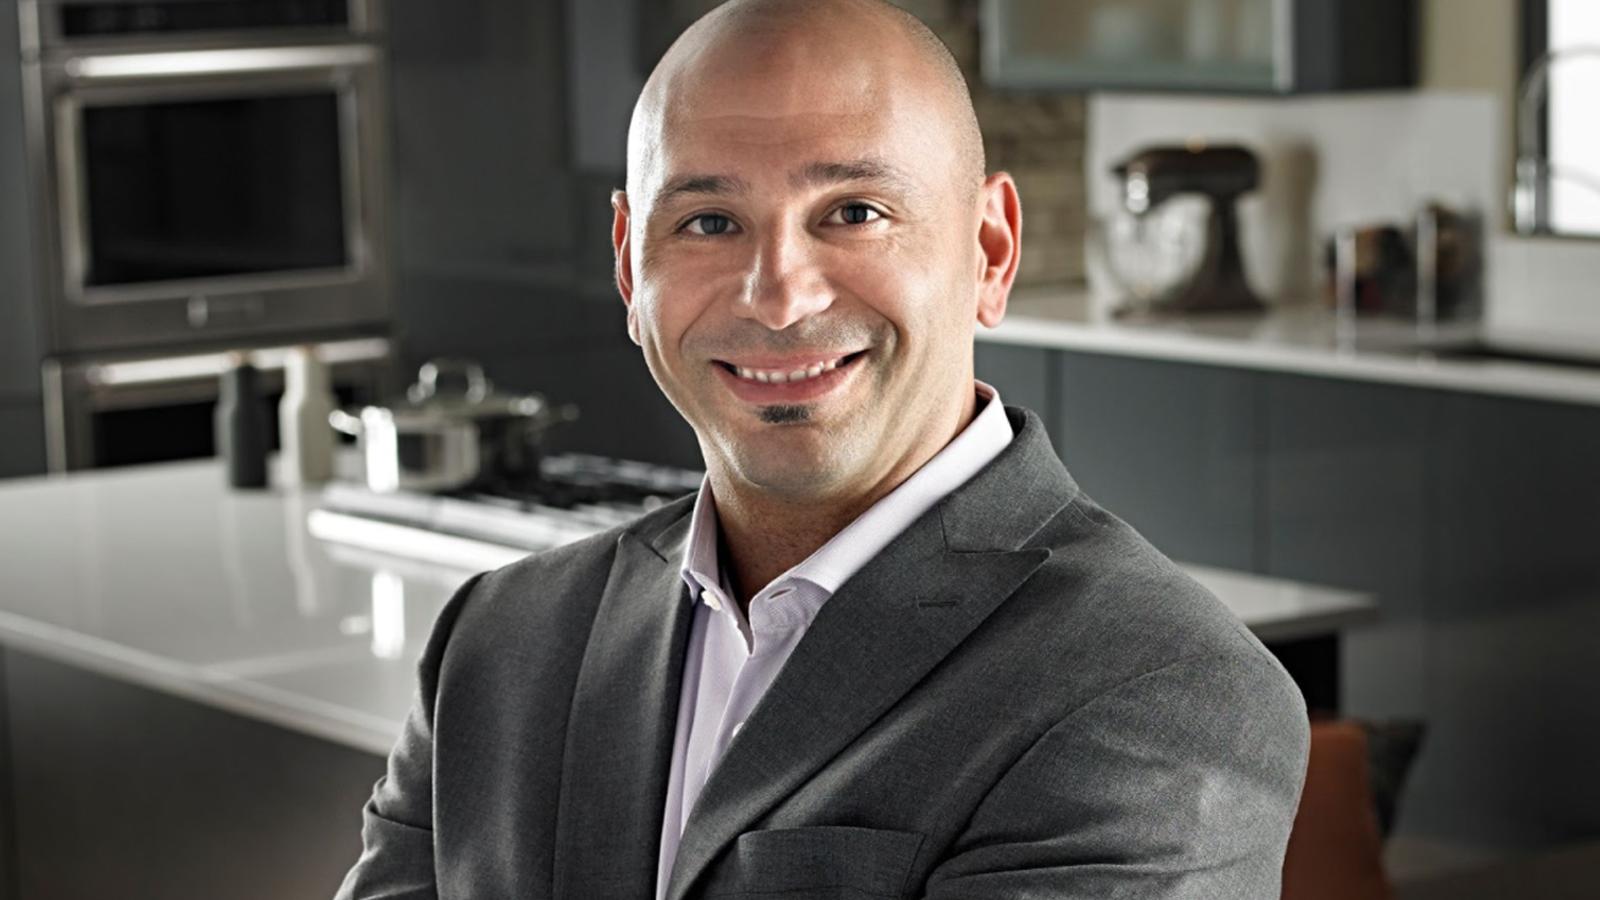 Joe Liotine, Executive Vice President, Whirlpool Corporation North America Region